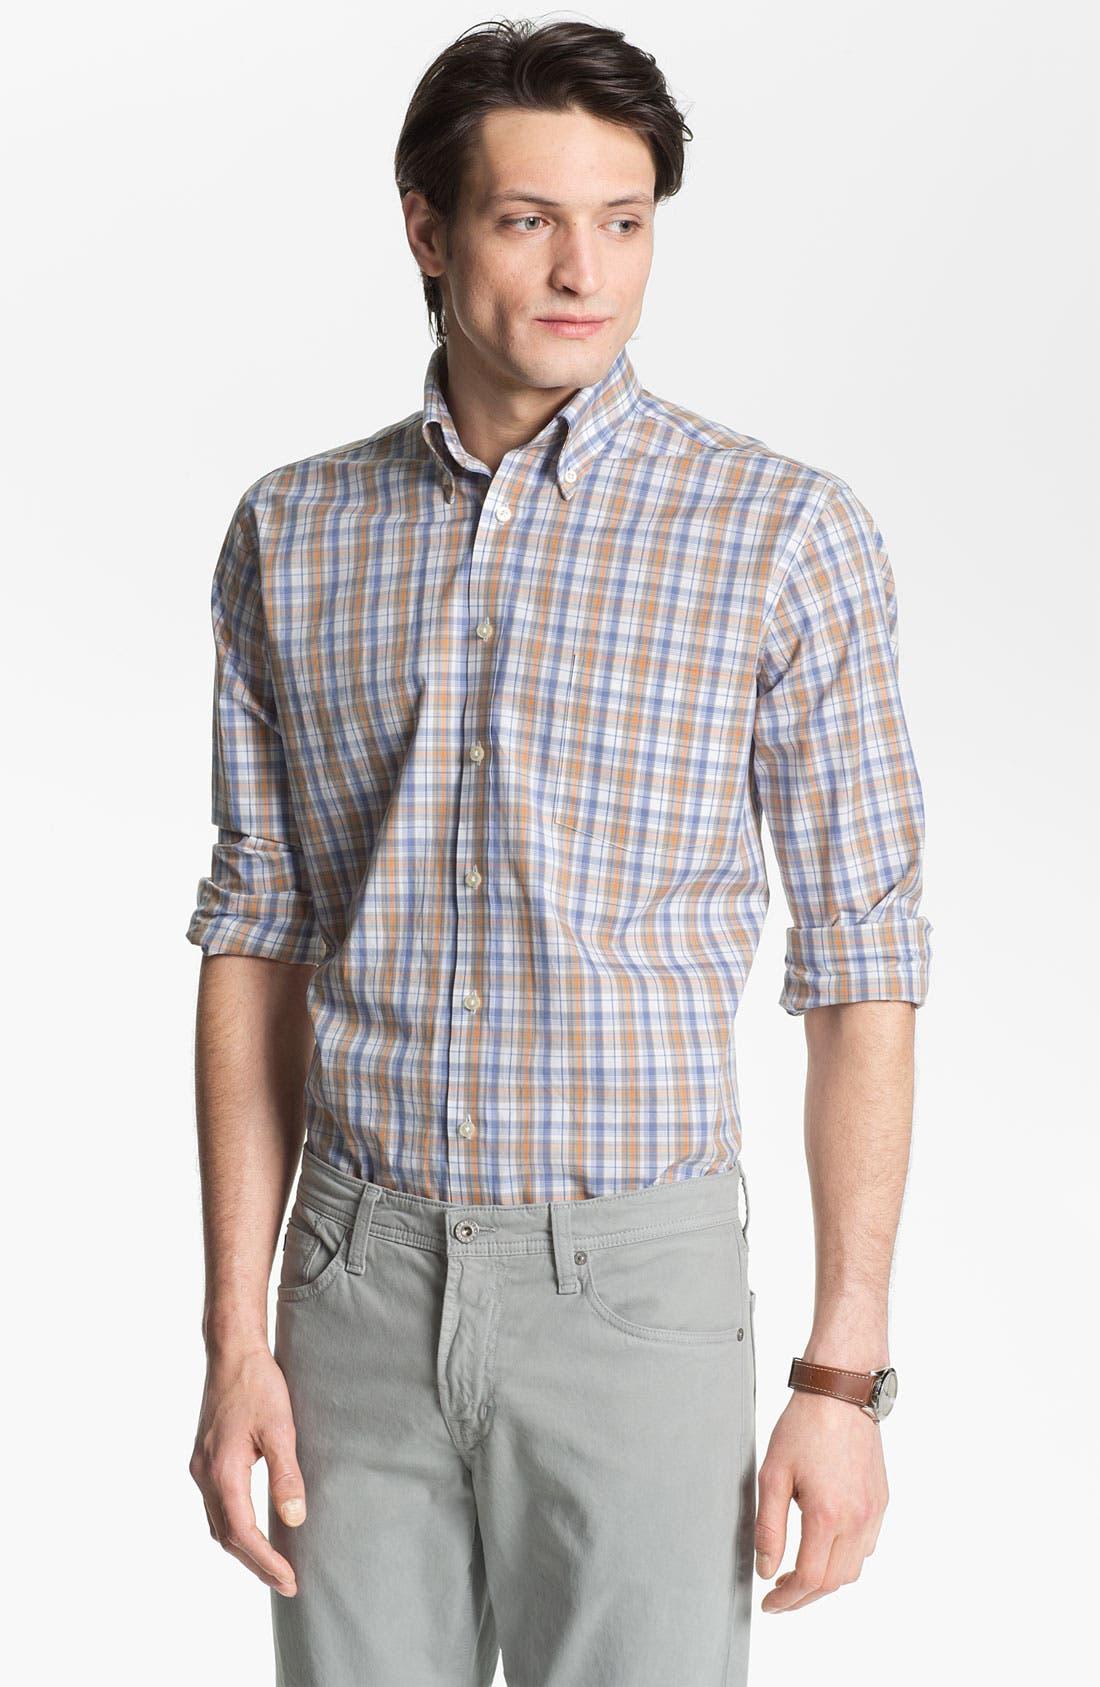 Alternate Image 1 Selected - Maker & Company Regular Fit Sport Shirt (Online Only)